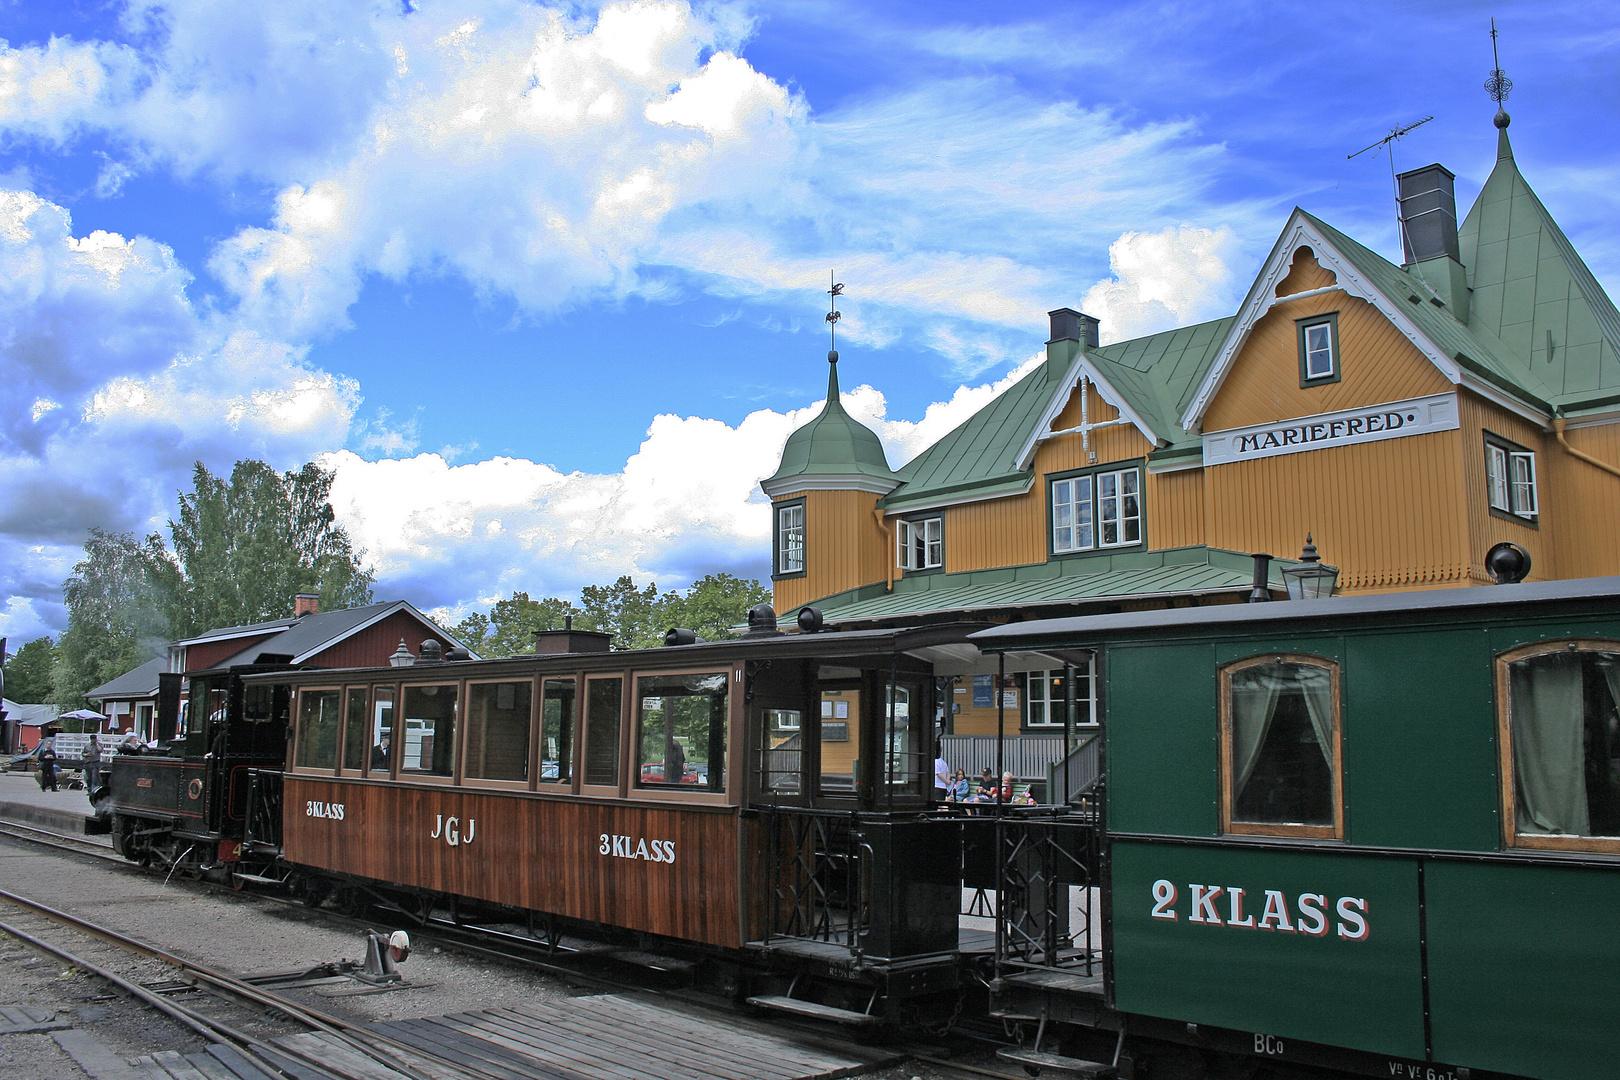 Bahnhof Mariefred